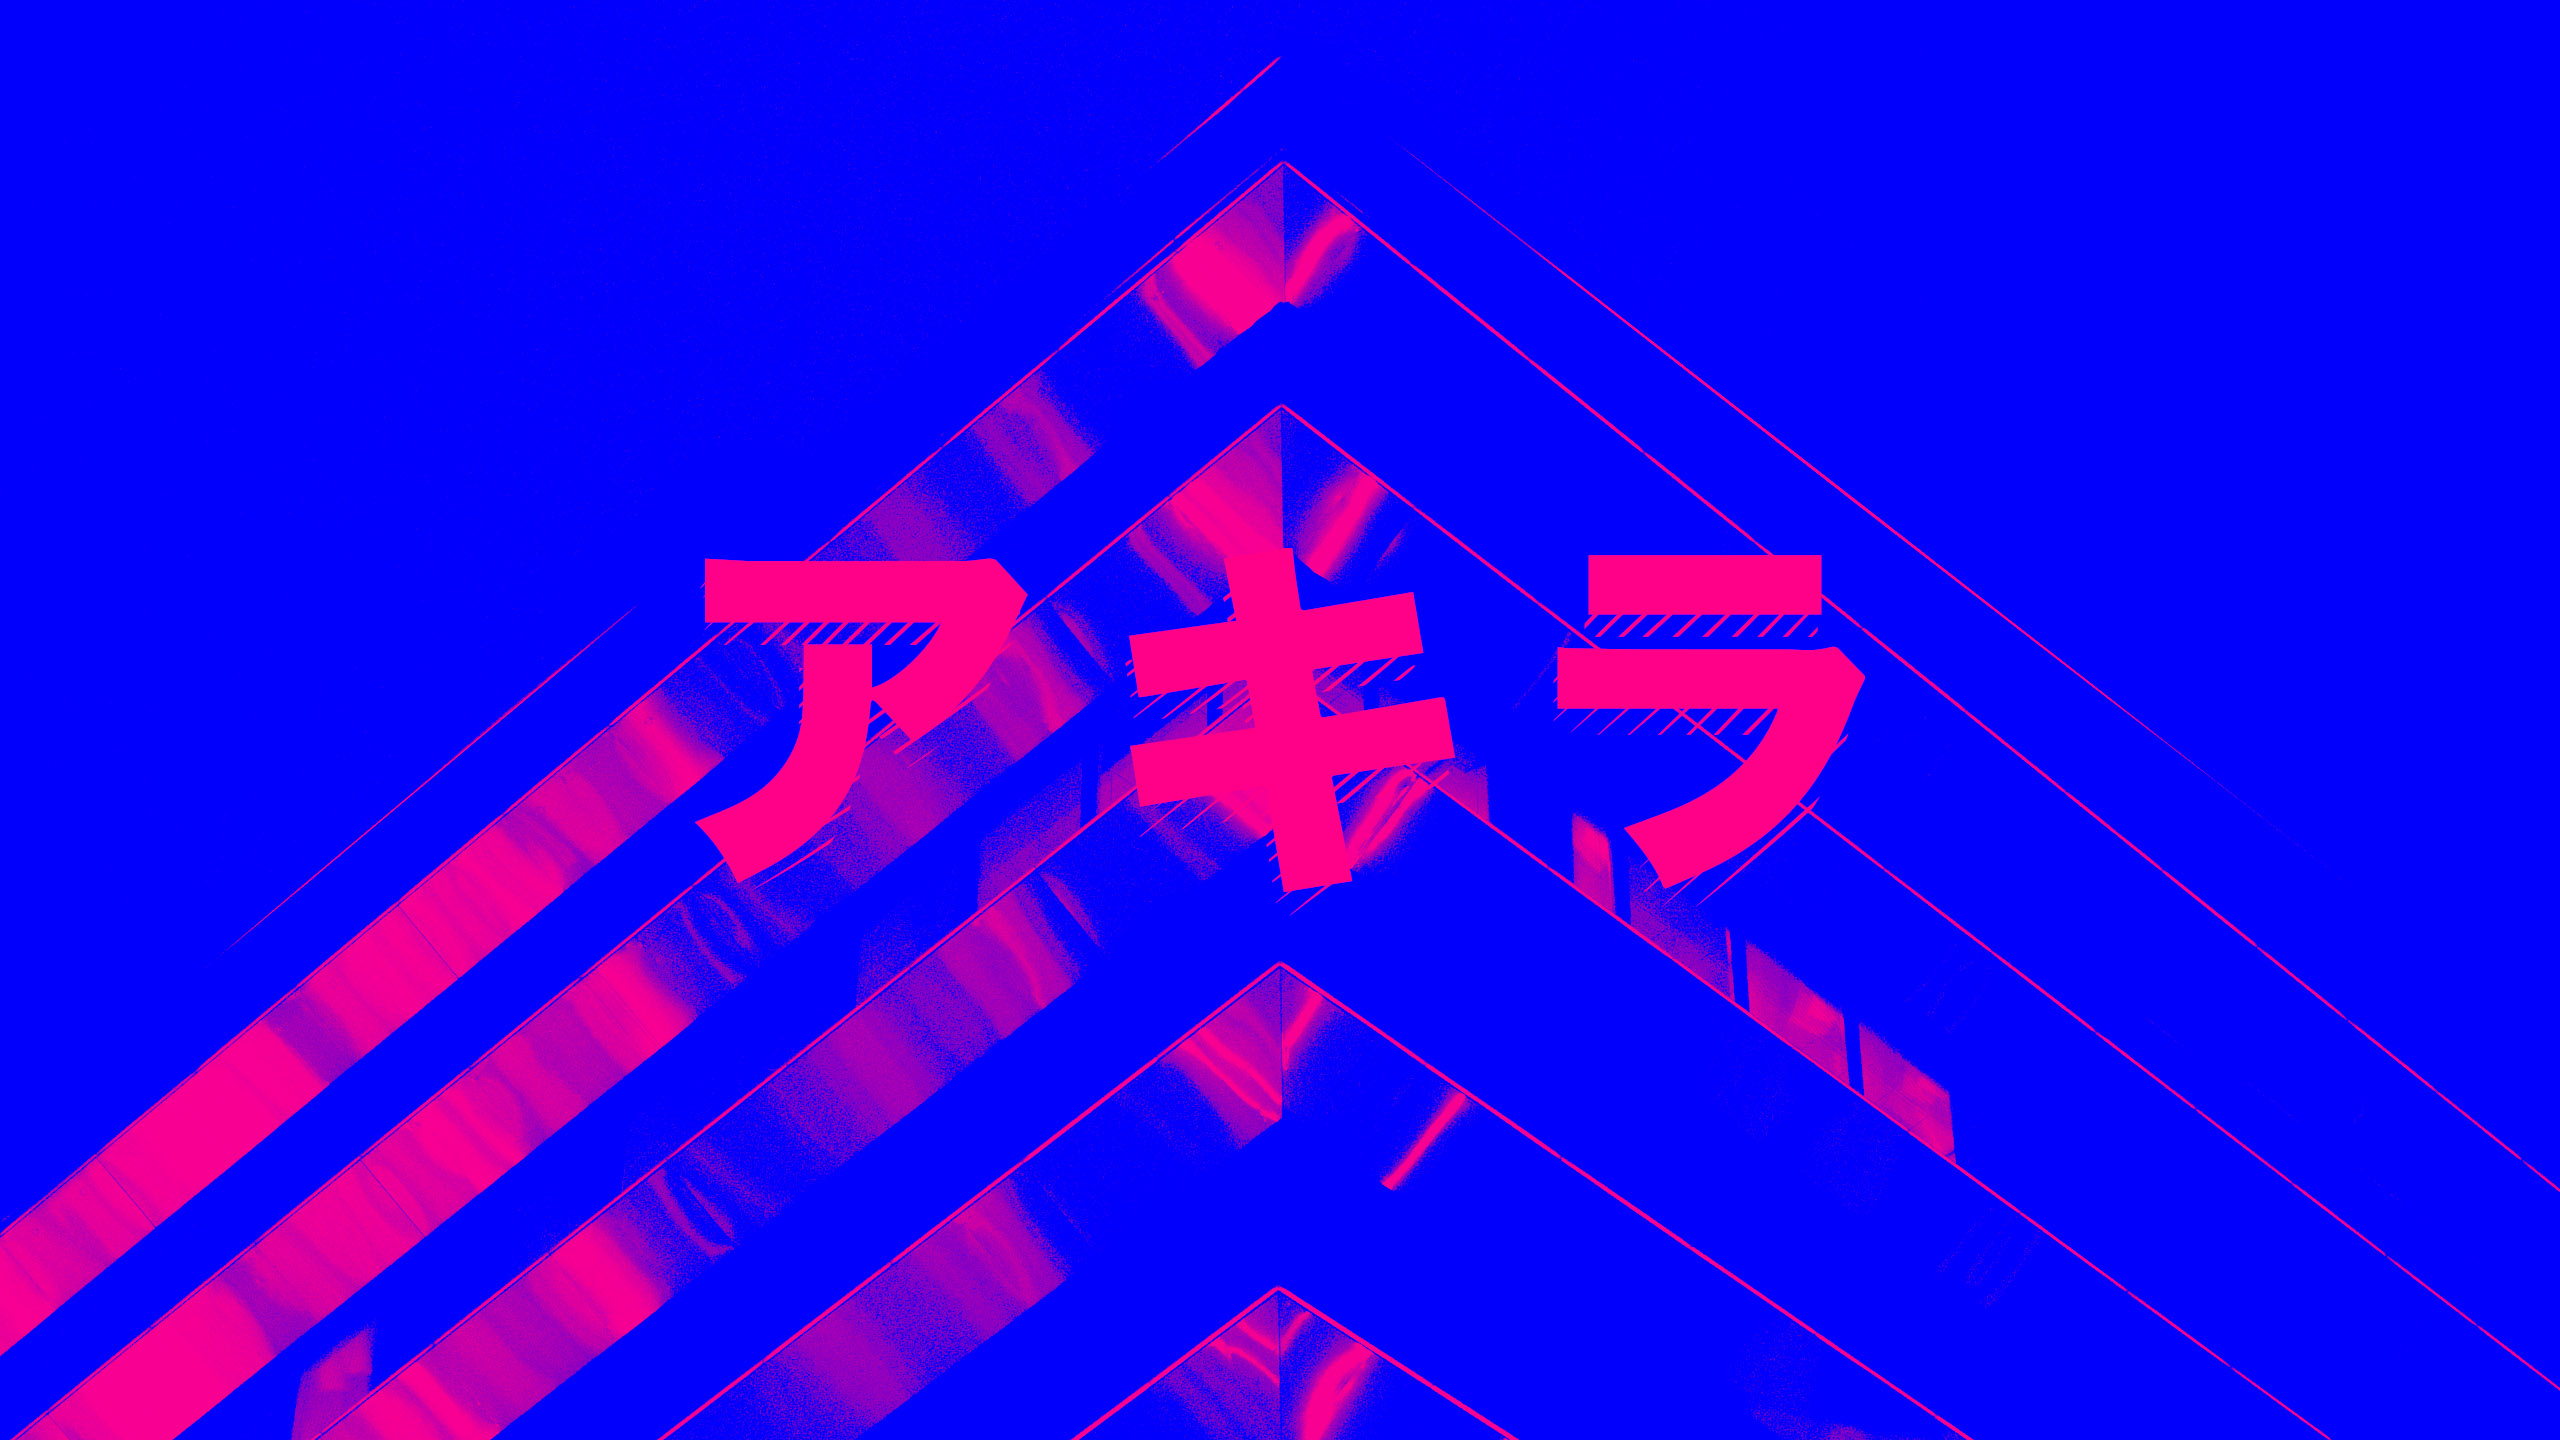 Antoine Ghioni - Akira silhouette background